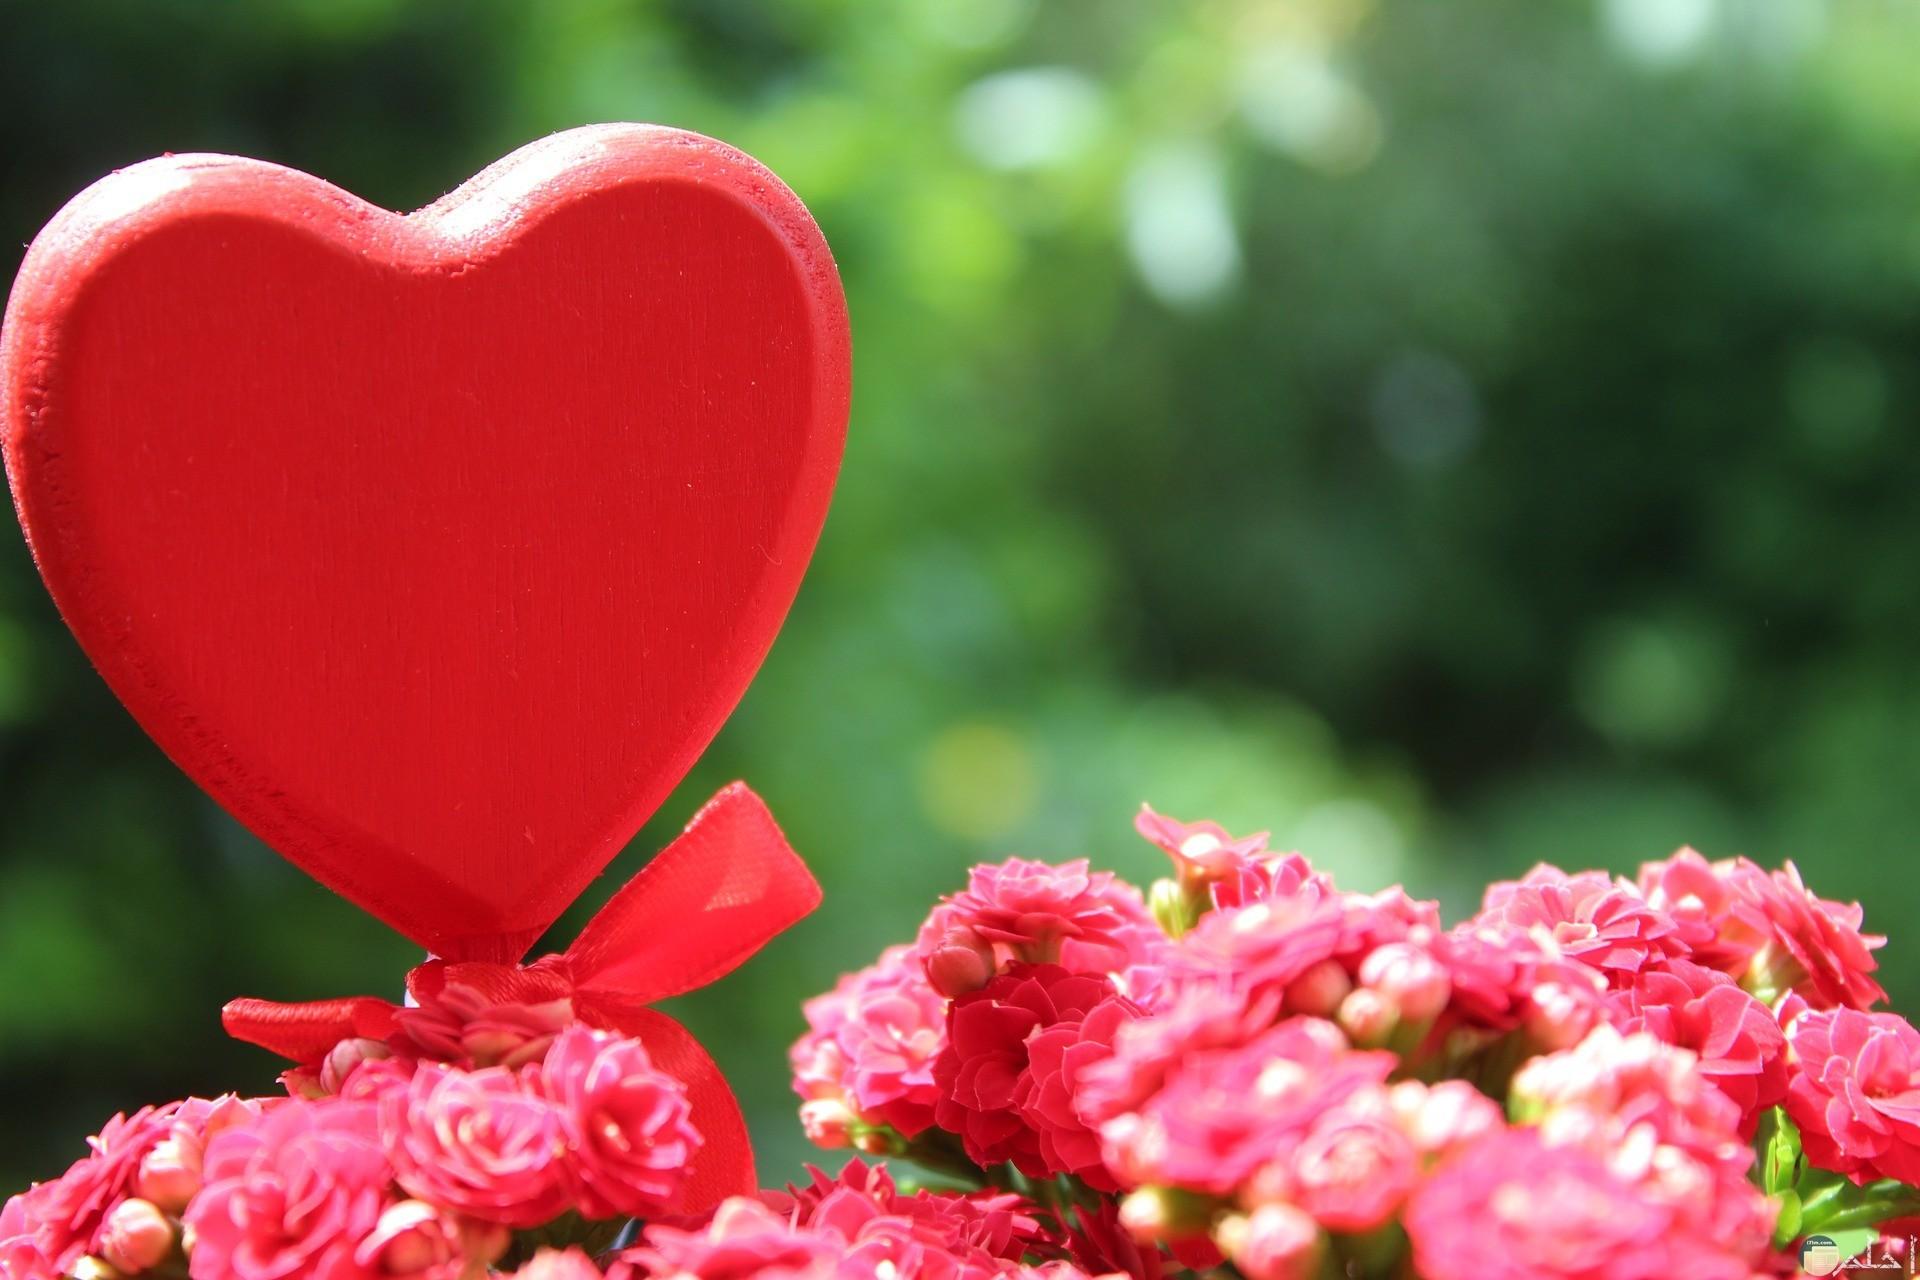 قلب احمر بجوار مجموعه ورود